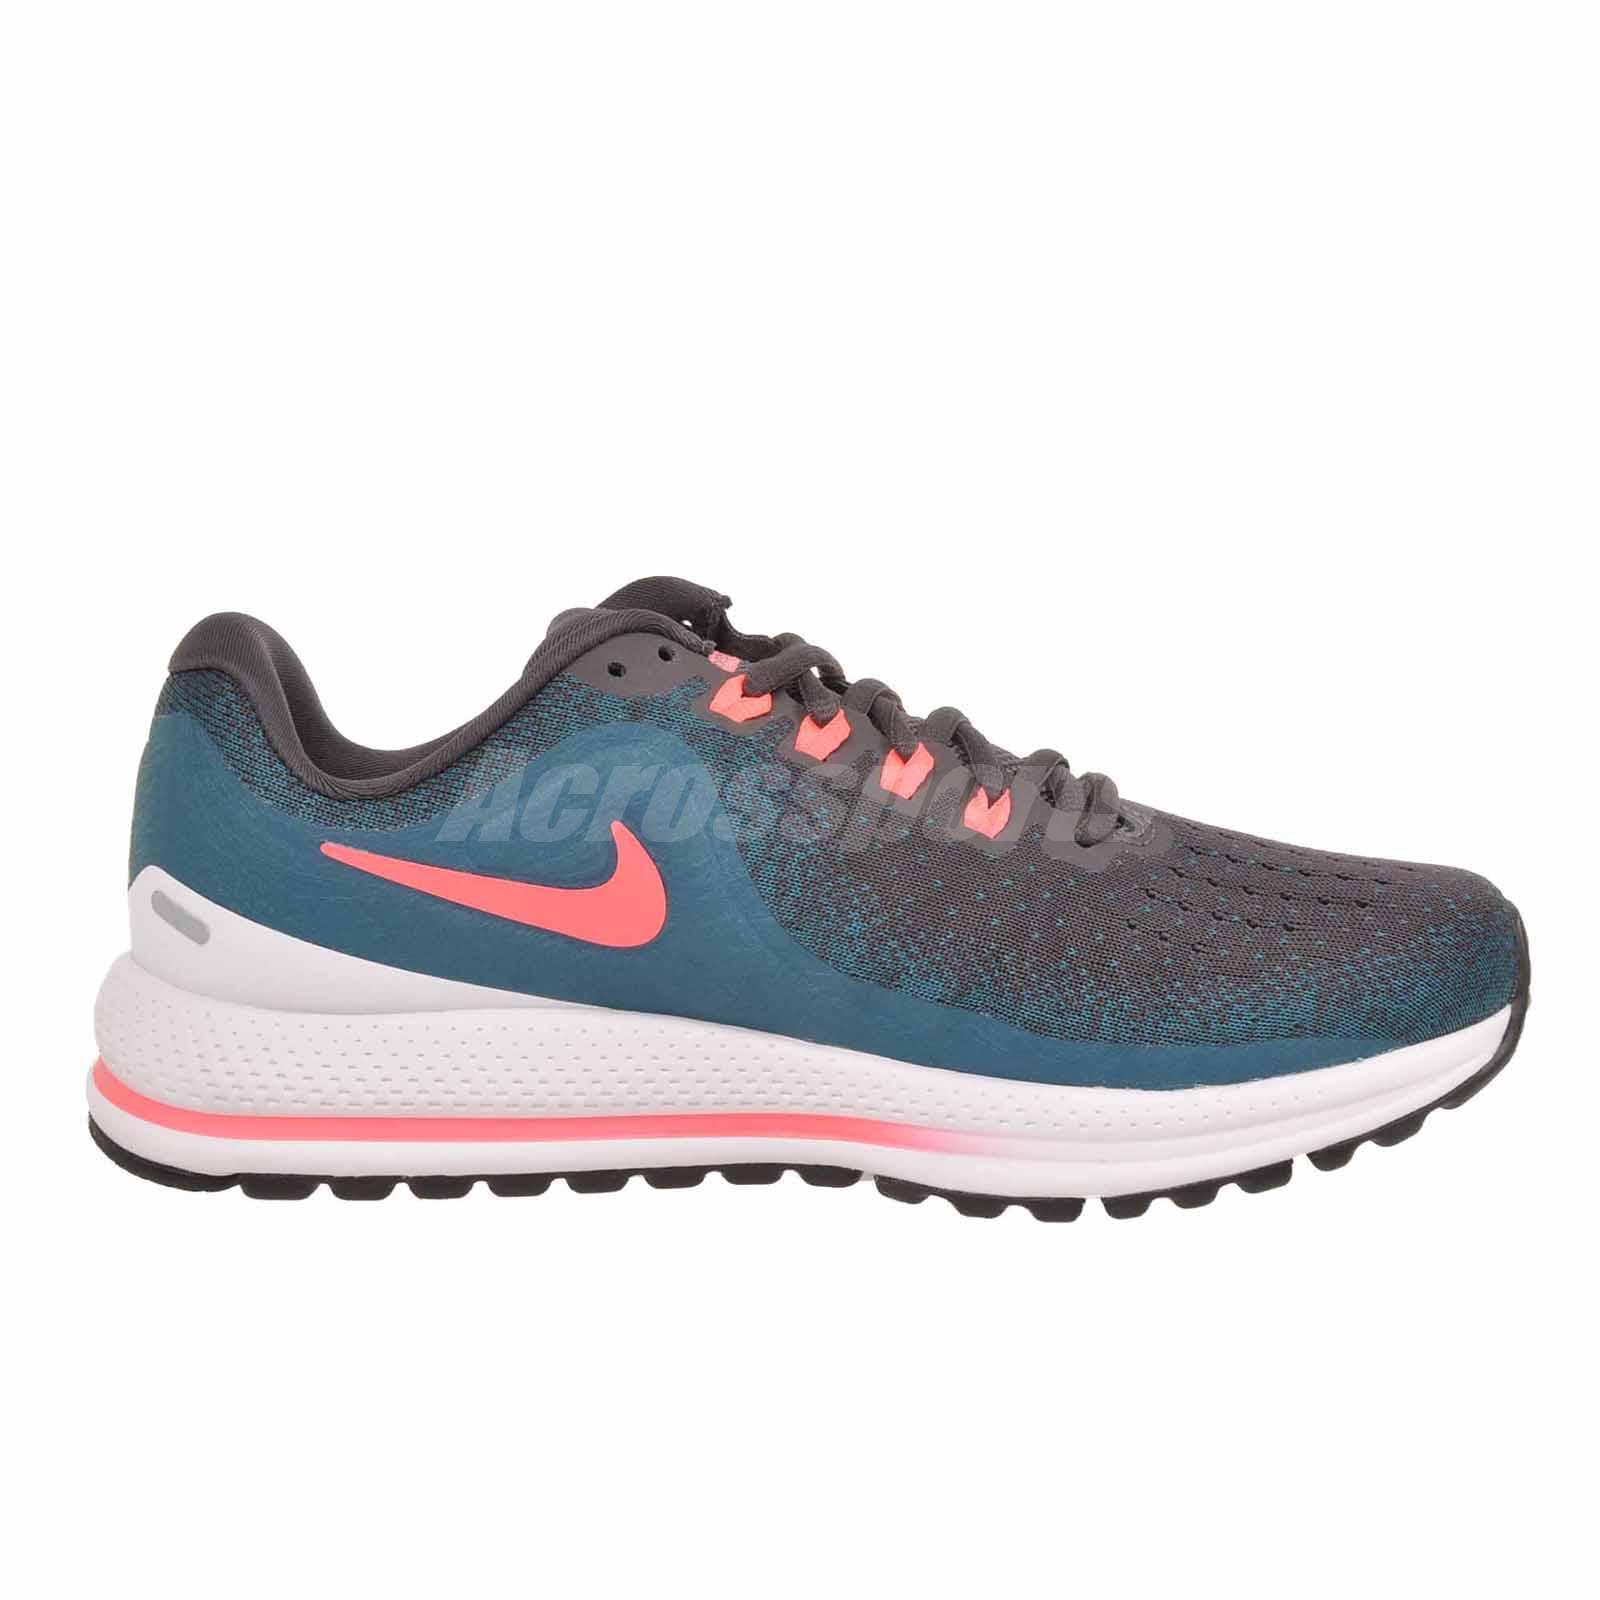 5a8a23442e6e1 Nike Air Zoom Vomero 13 Running Womens Shoes Grey Blue Punch 922909 ...